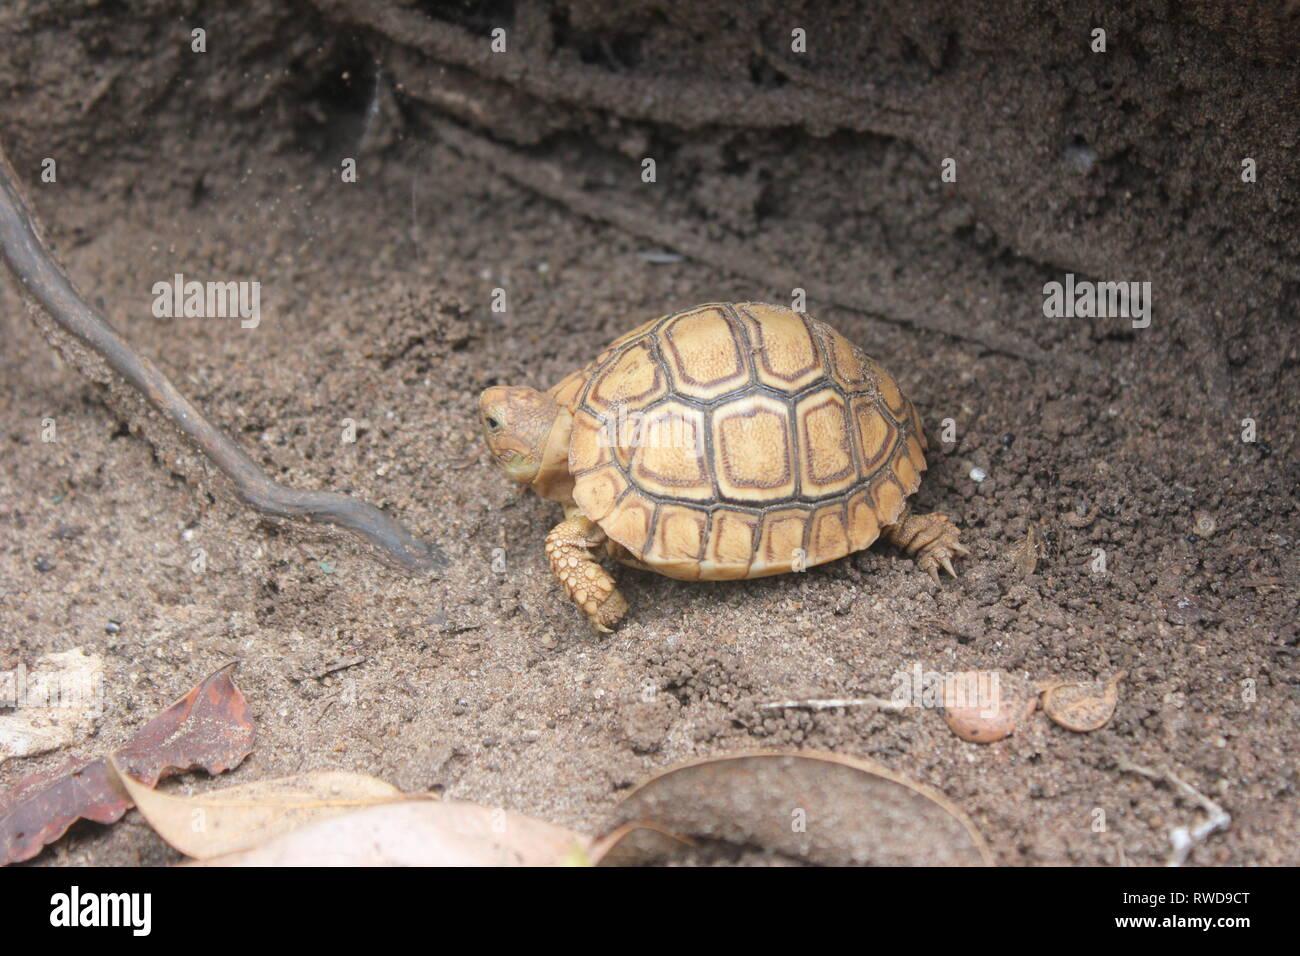 A juvenile Leopard Tortoise (Geochelone pardalis) in the coatal bush of Diani Beach, Kenya. - Stock Image